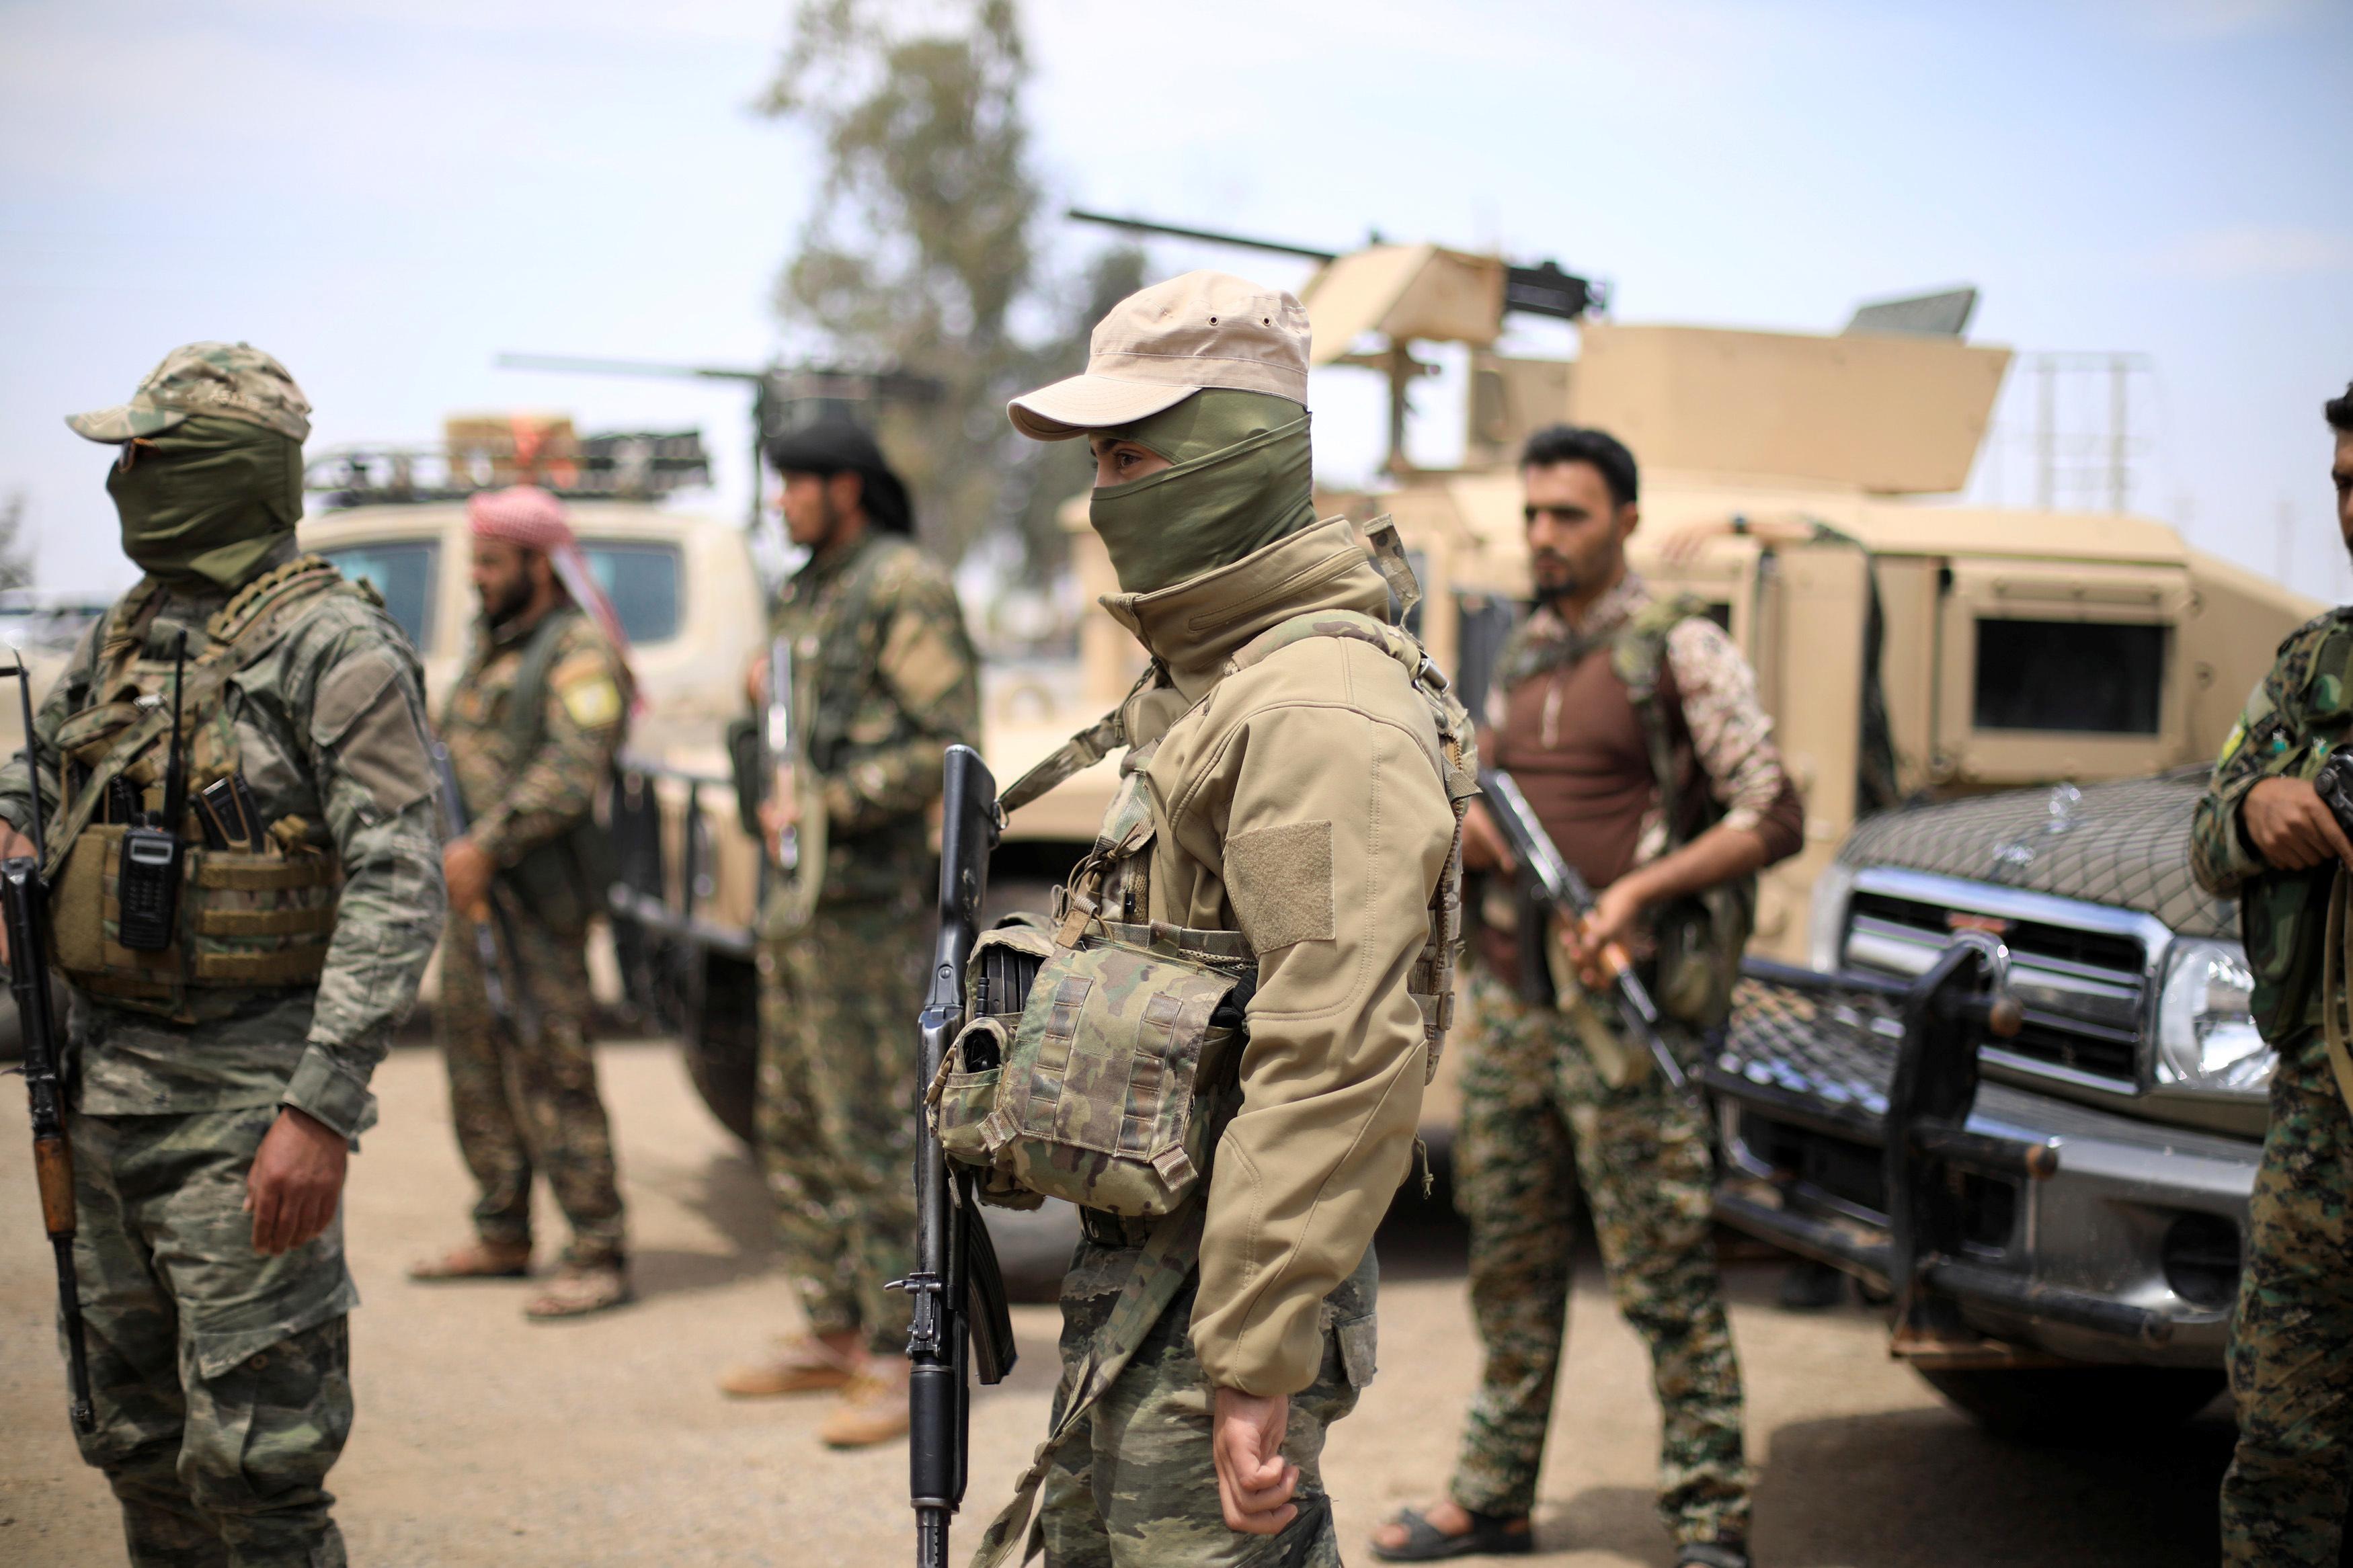 SDF soldiers in Deir ez-Zor (Reuters)